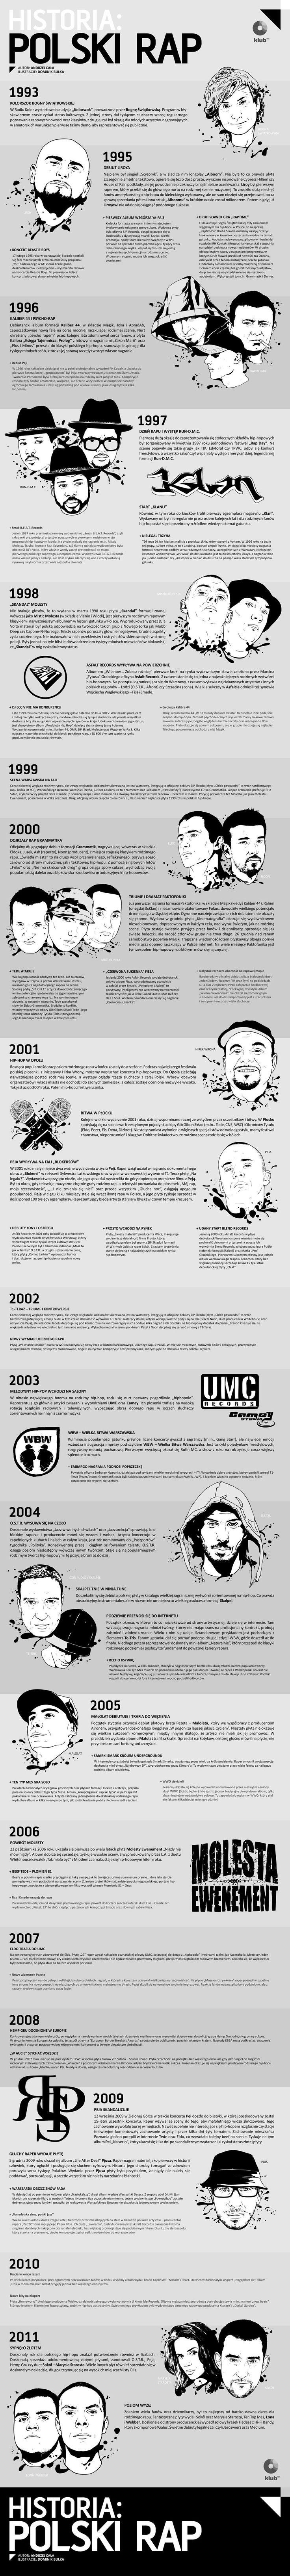 Historia polskiego hip-hopu